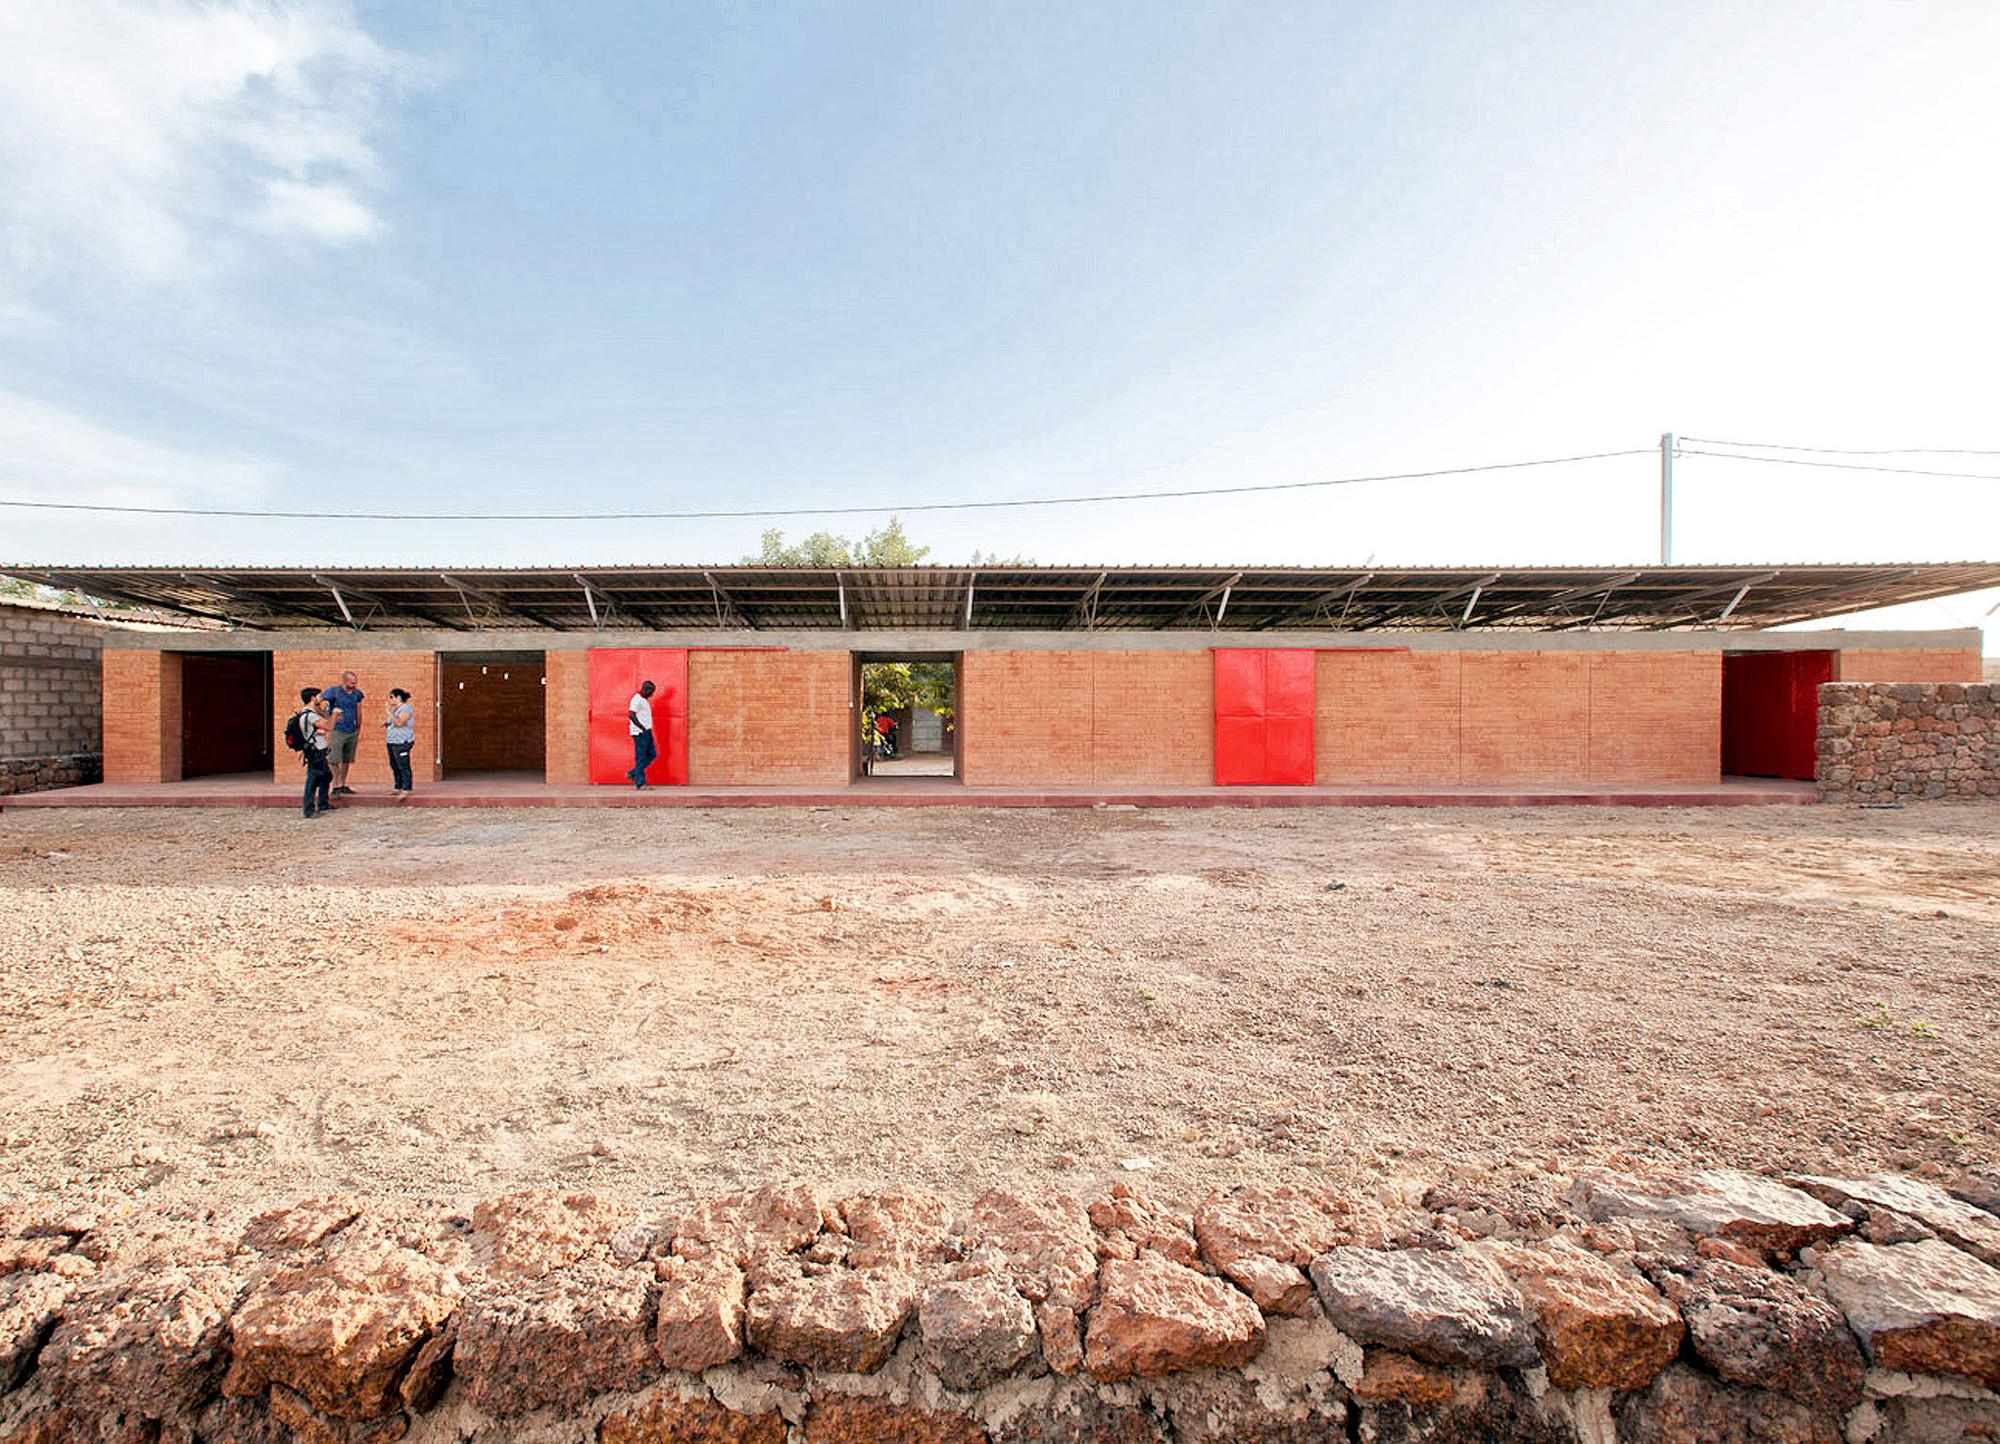 Centro de Integración Escolar, Profesional y Deportiva / Albert Faus, © Ibai Rigby